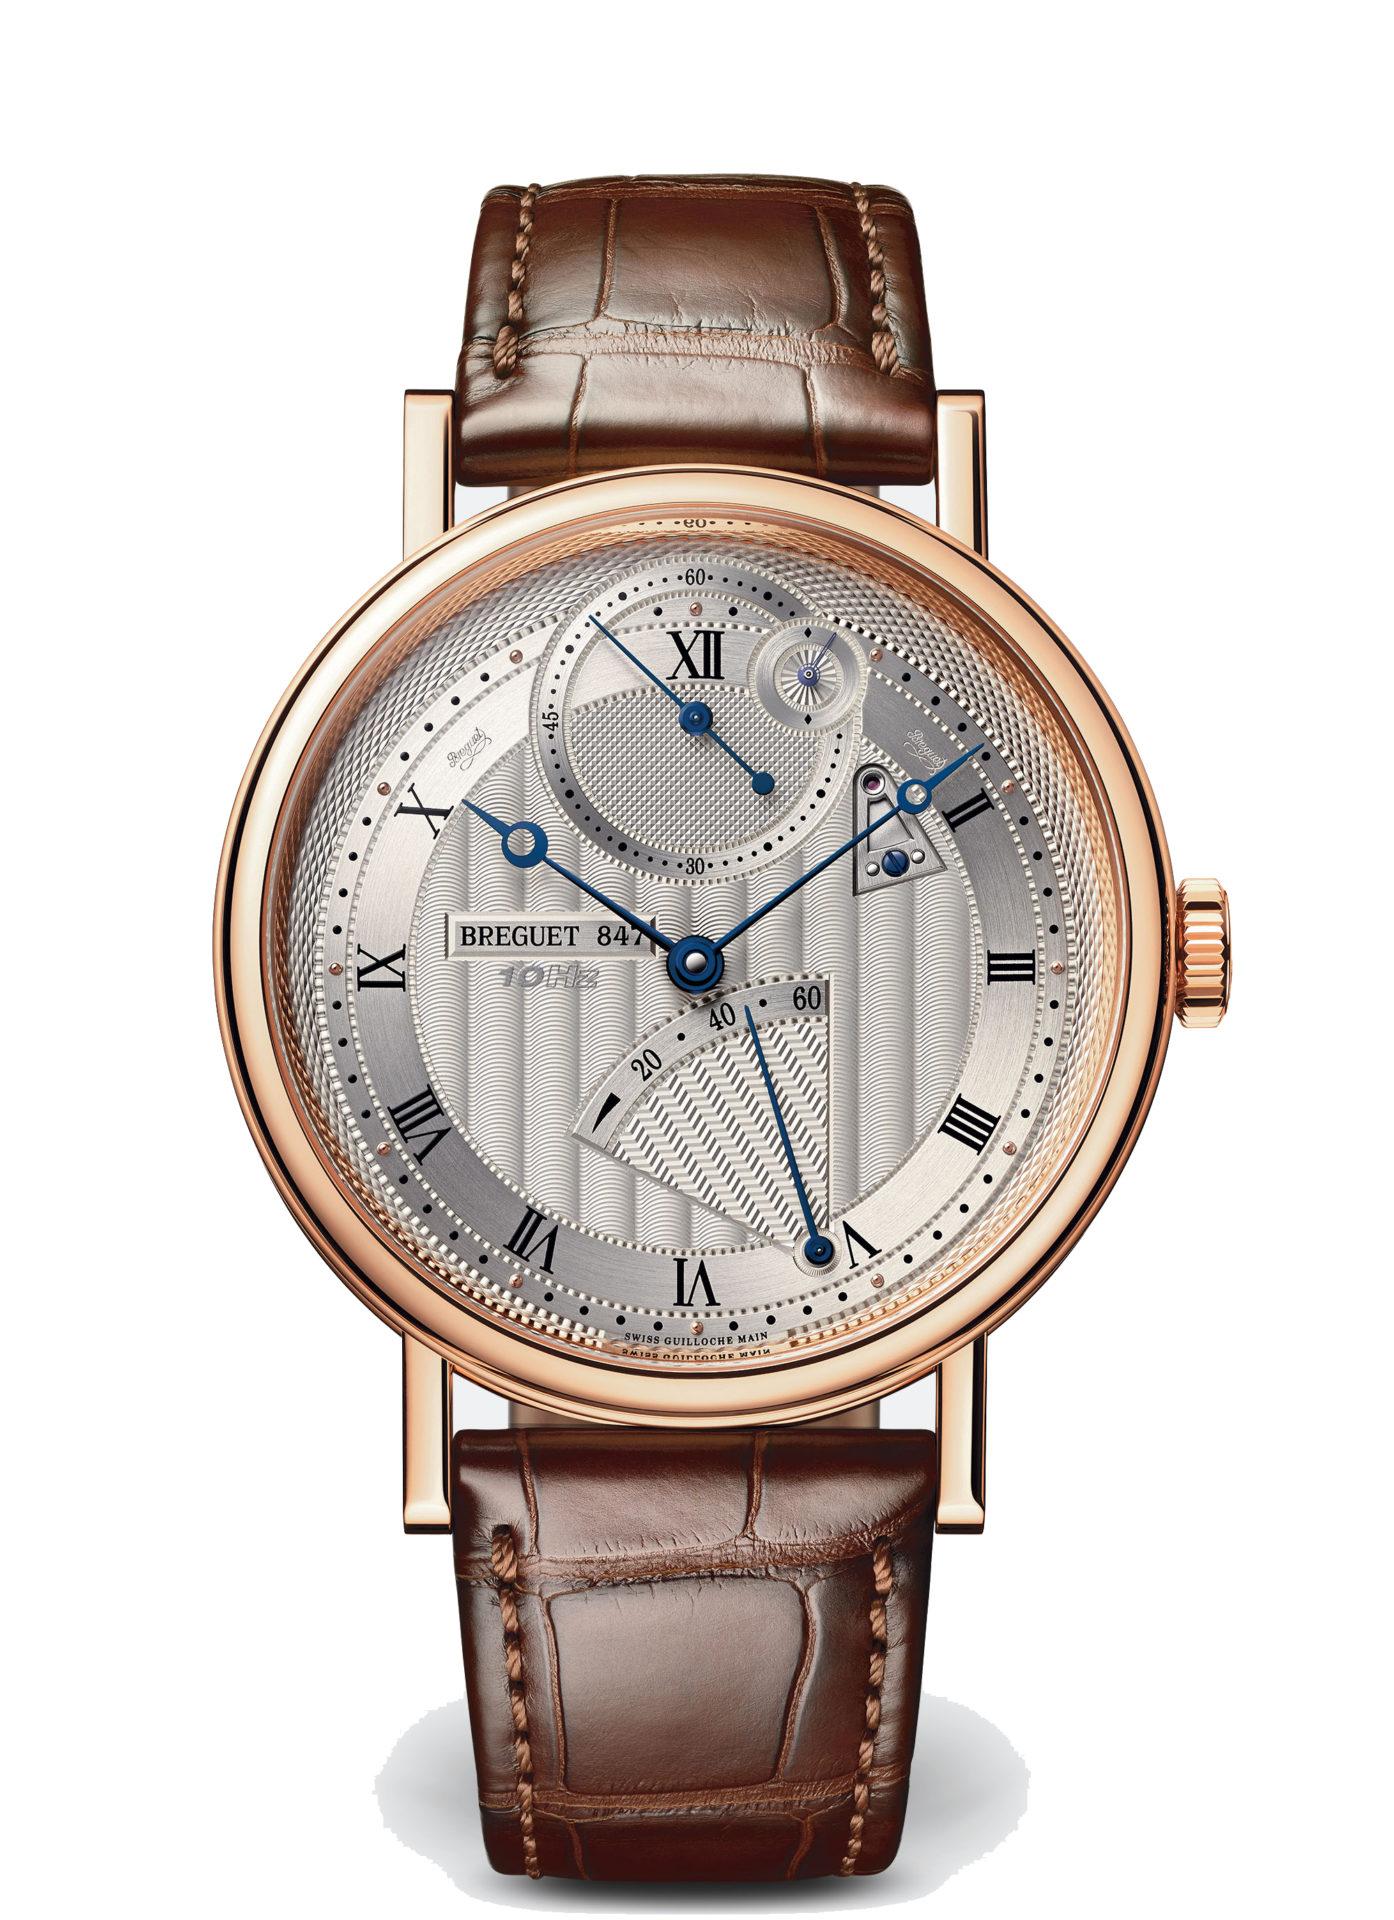 Breguet-Classique-Chronométrie-7727-Hall-of-Time-7727br-12-9wu